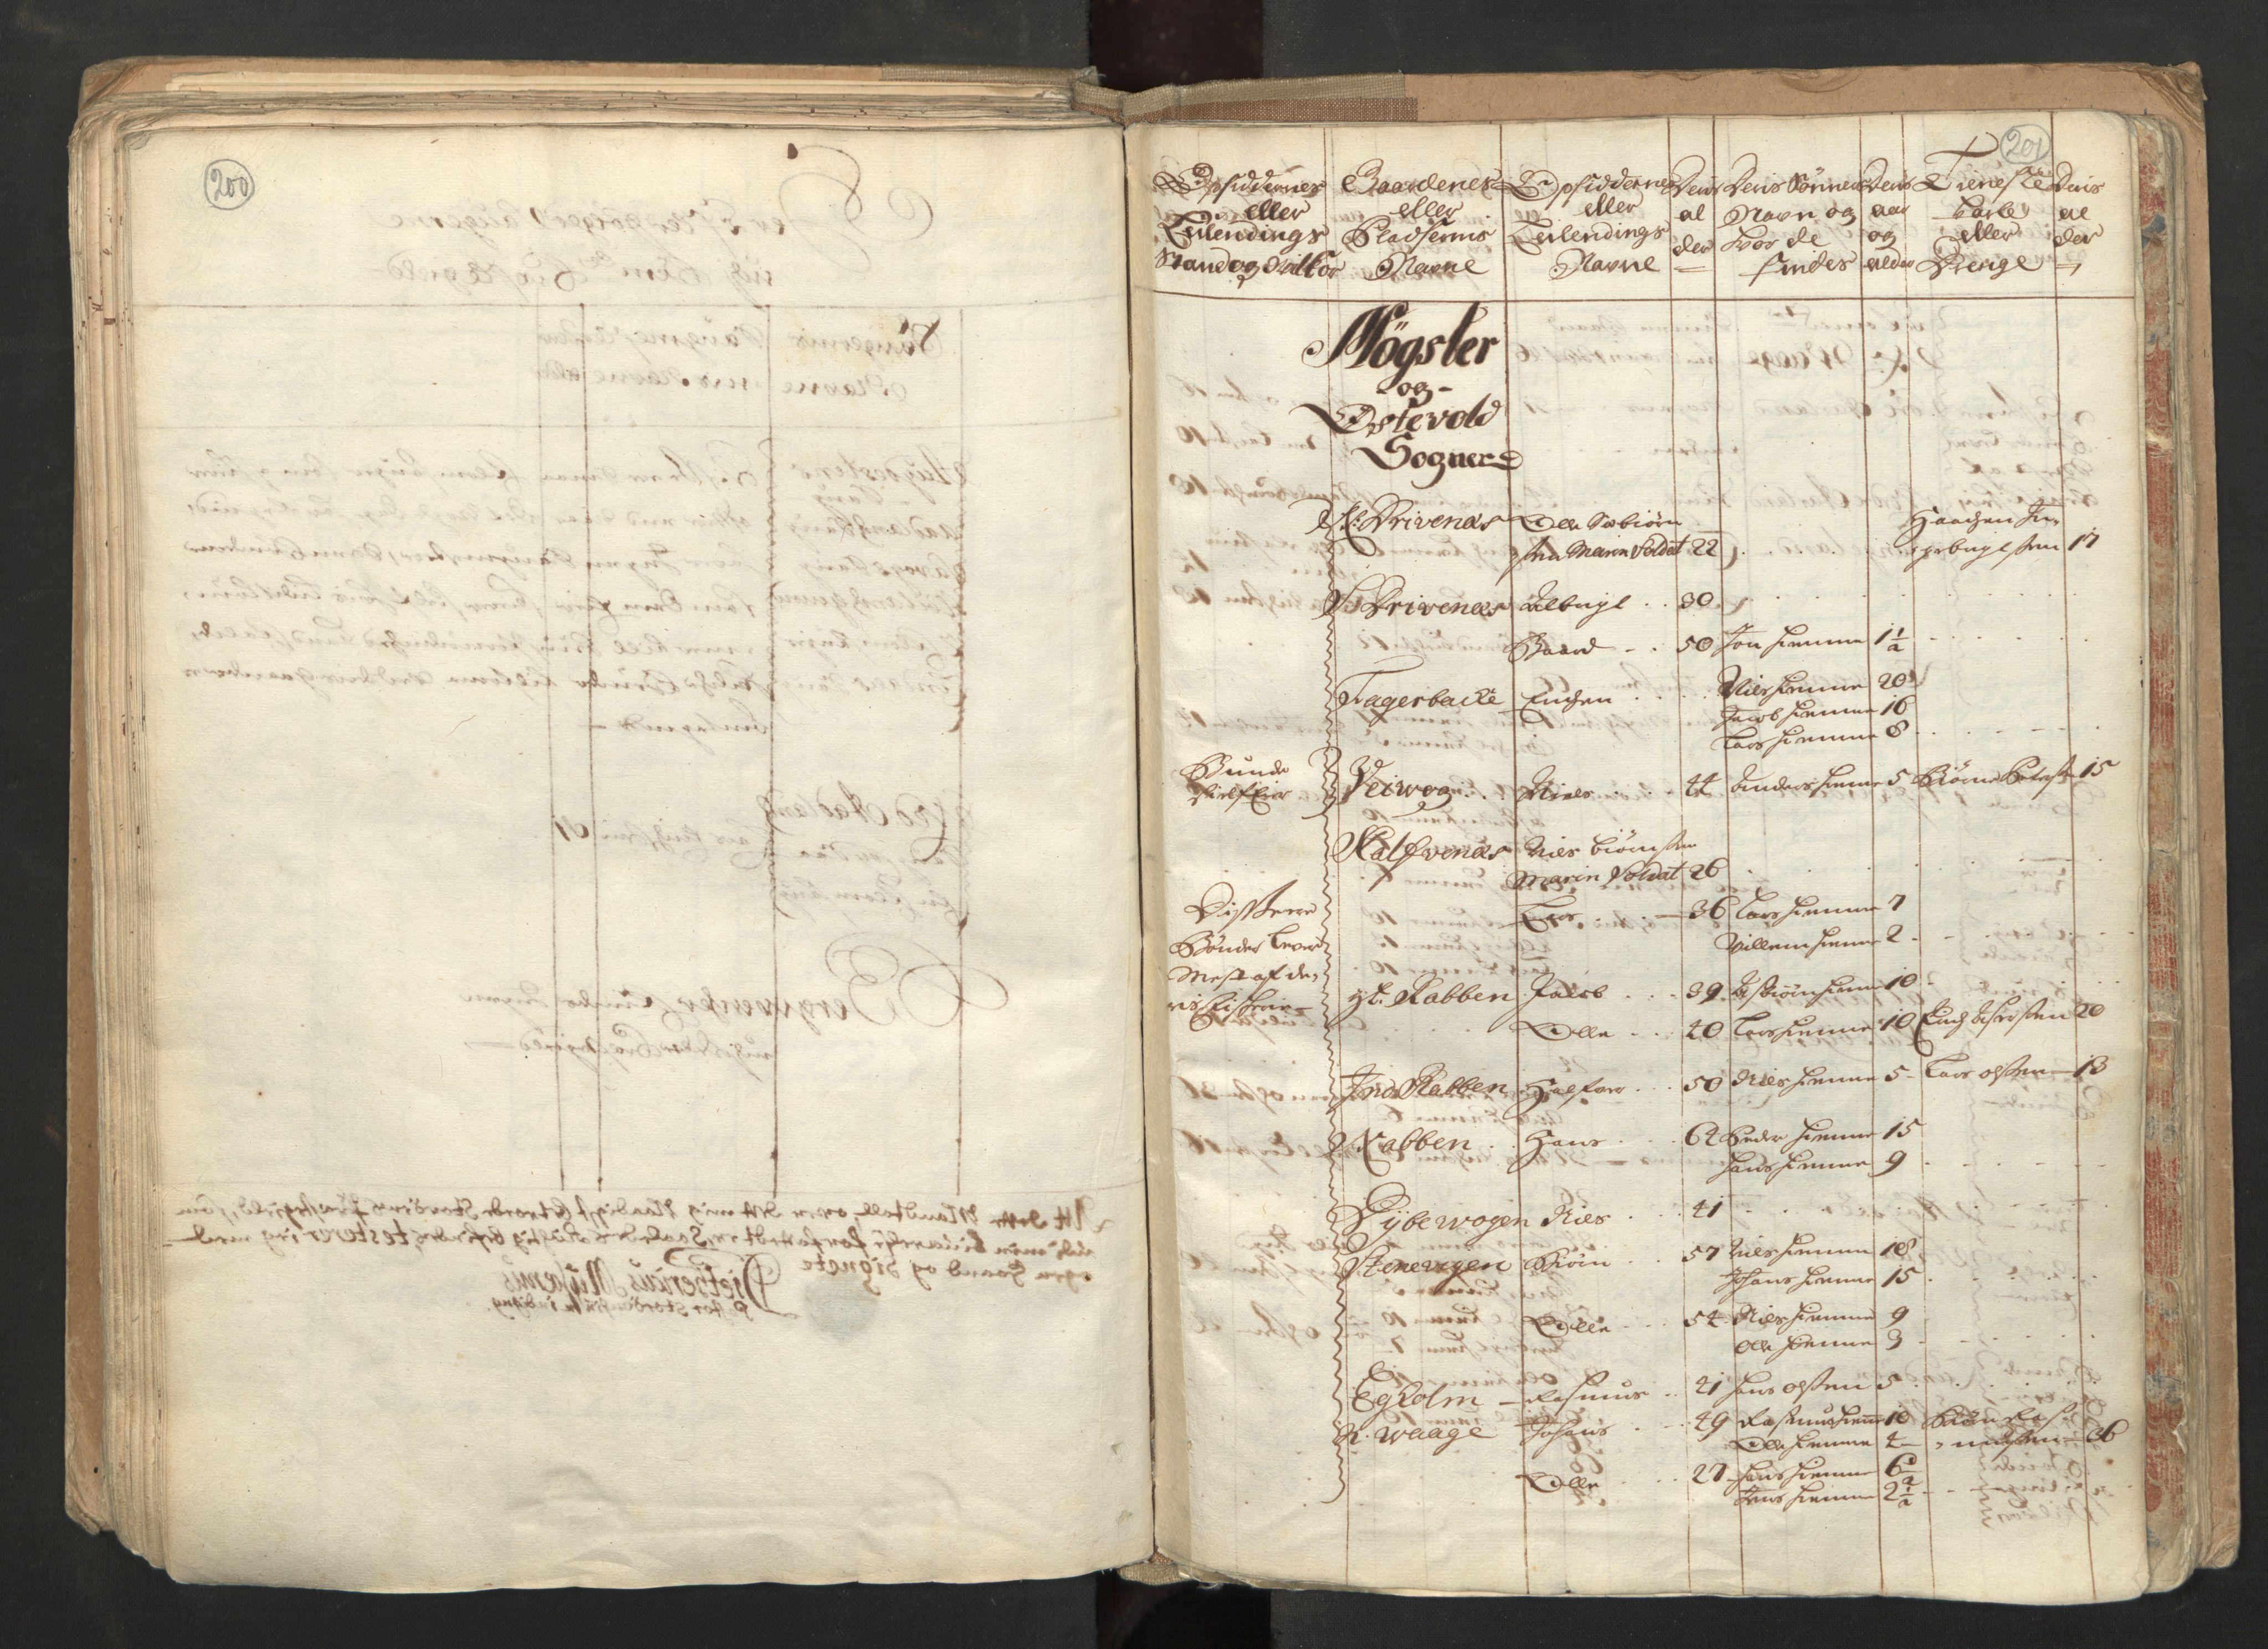 RA, Manntallet 1701, nr. 6: Sunnhordland fogderi og Hardanger fogderi, 1701, s. 200-201